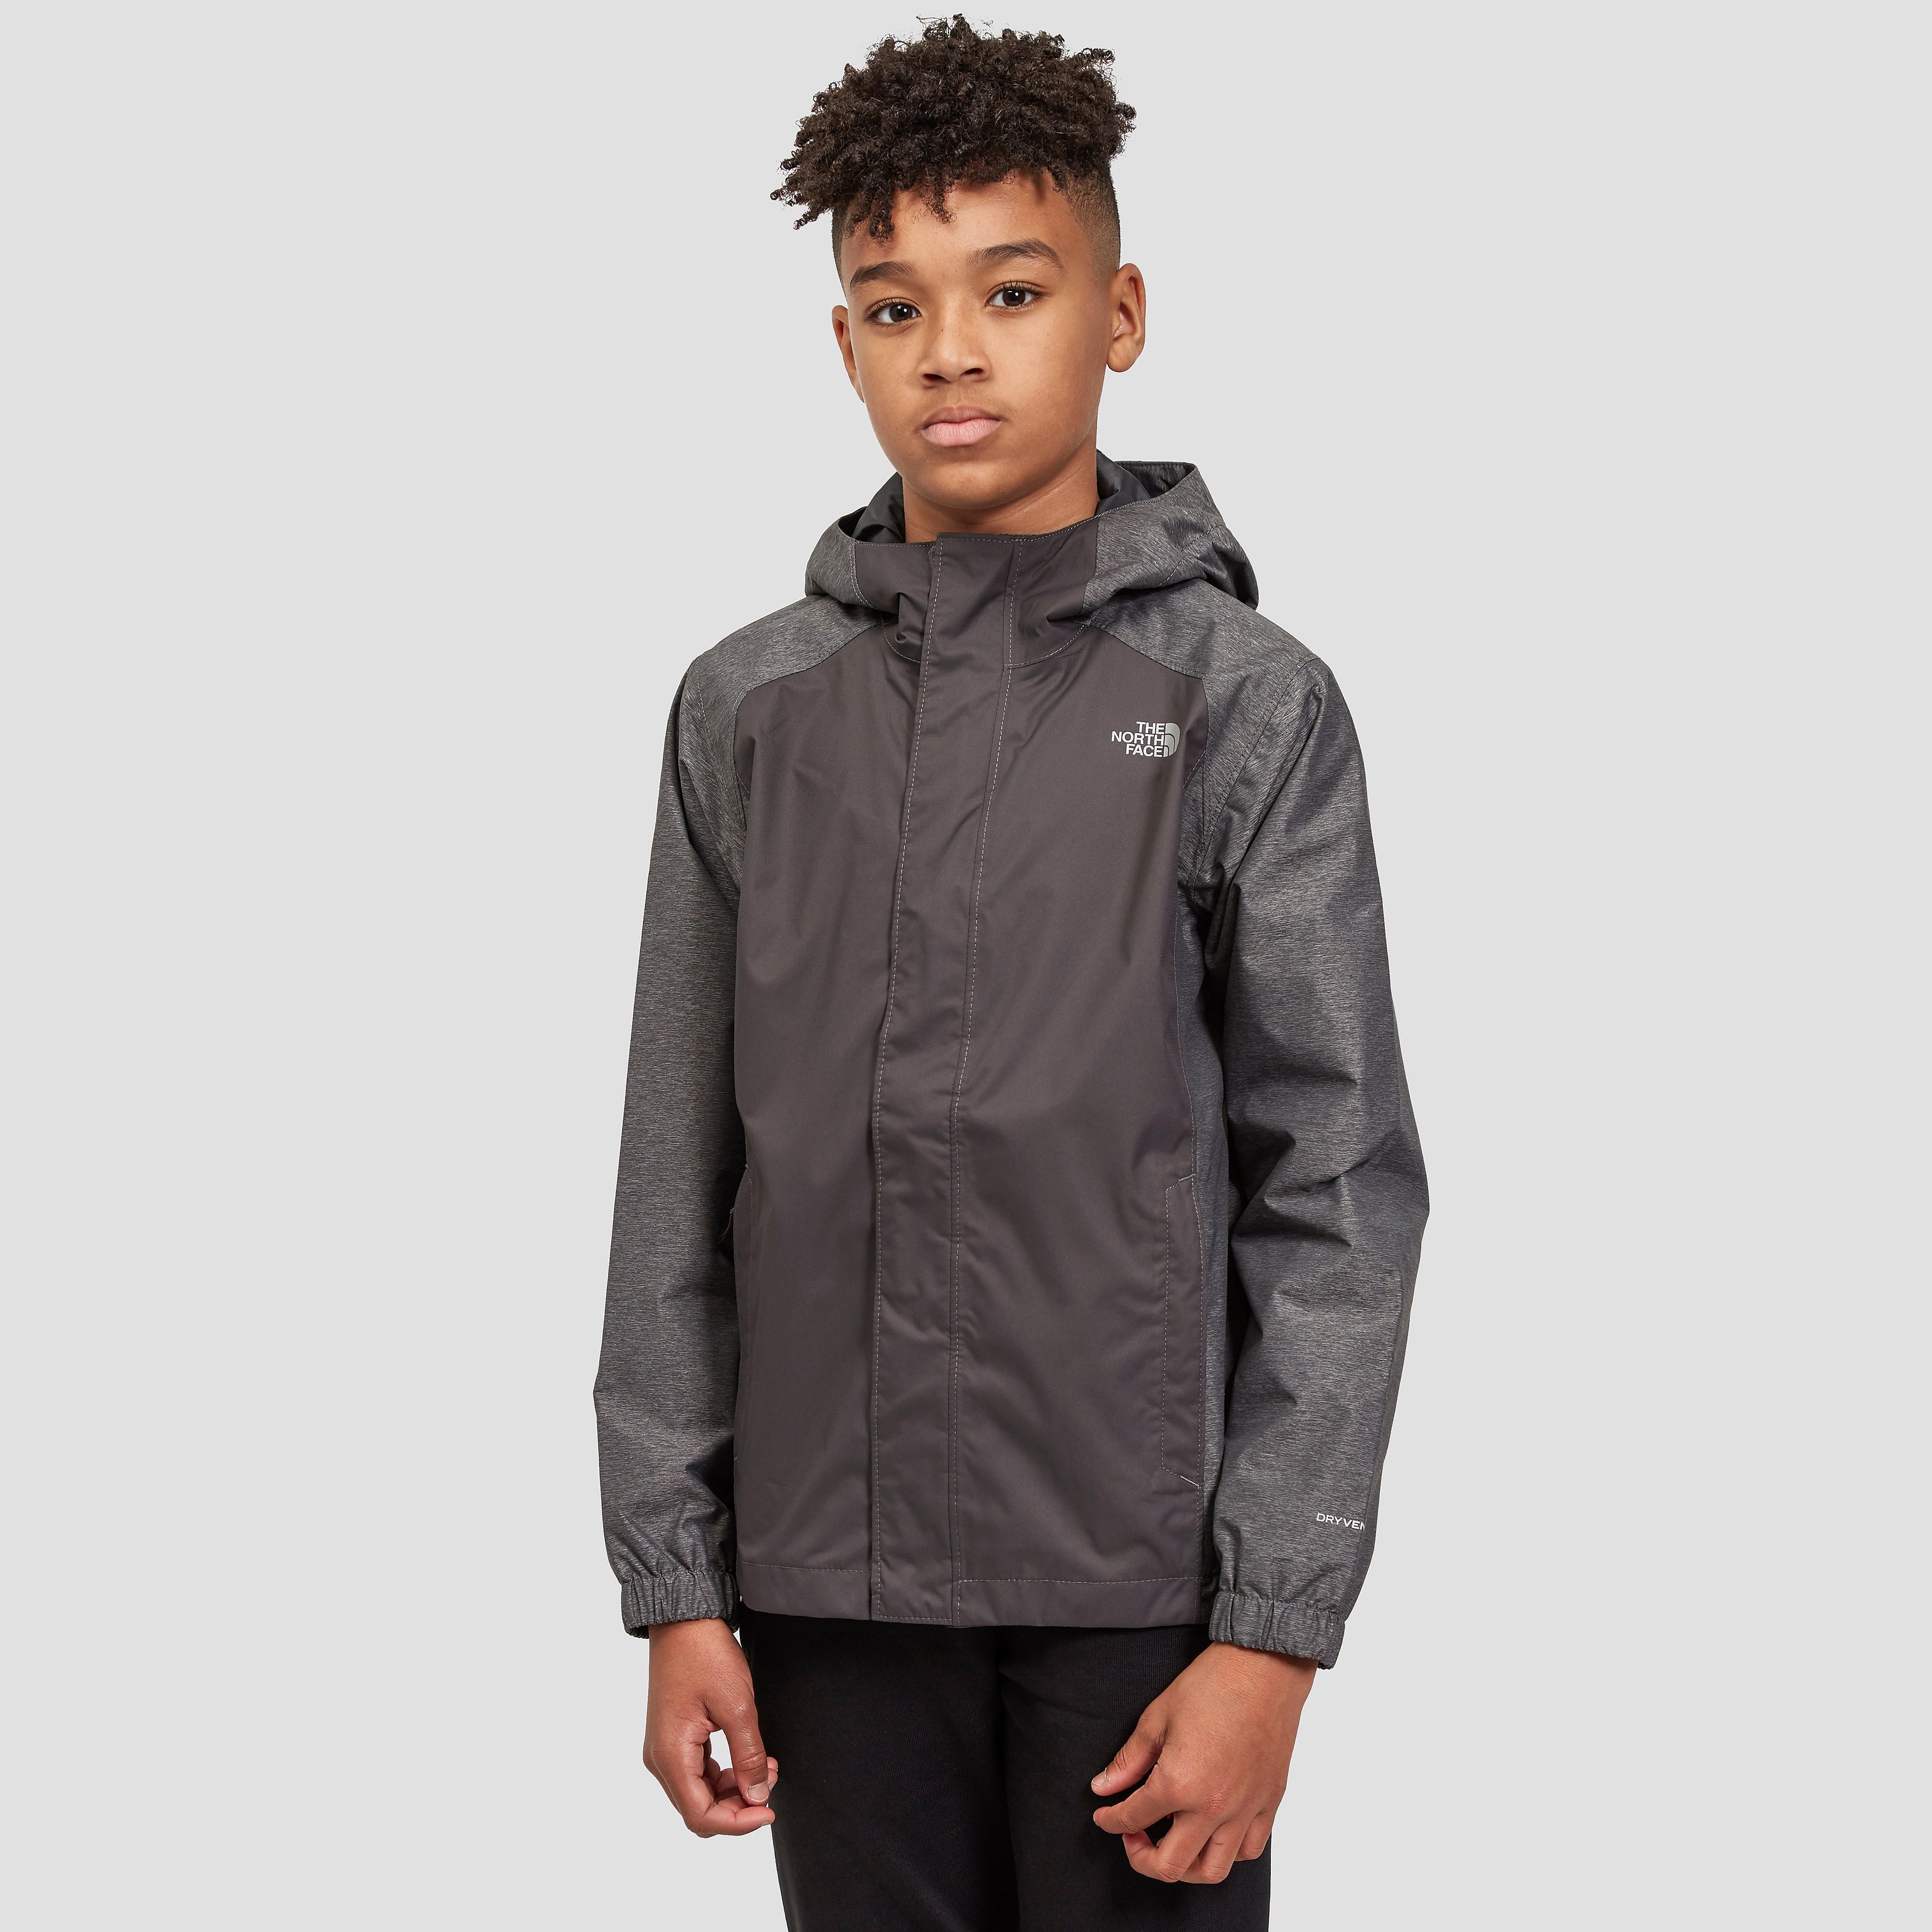 The North Face Resolve Junior Boys Jacket